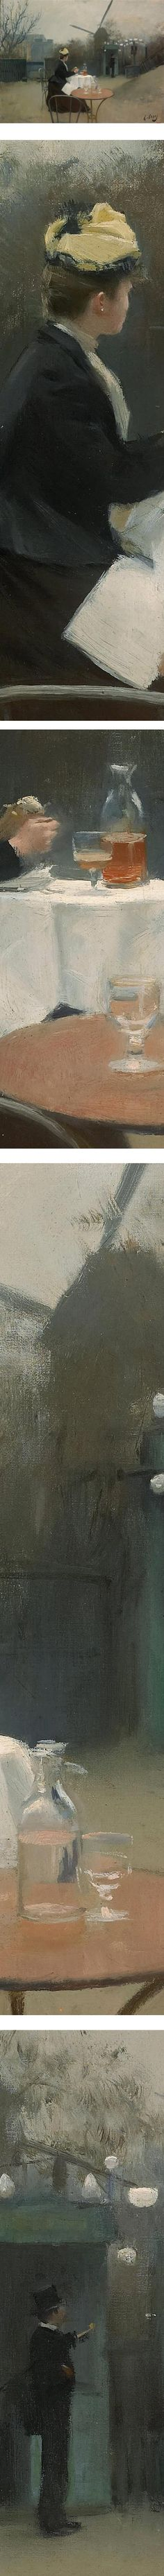 Plein air, Ramon Casas